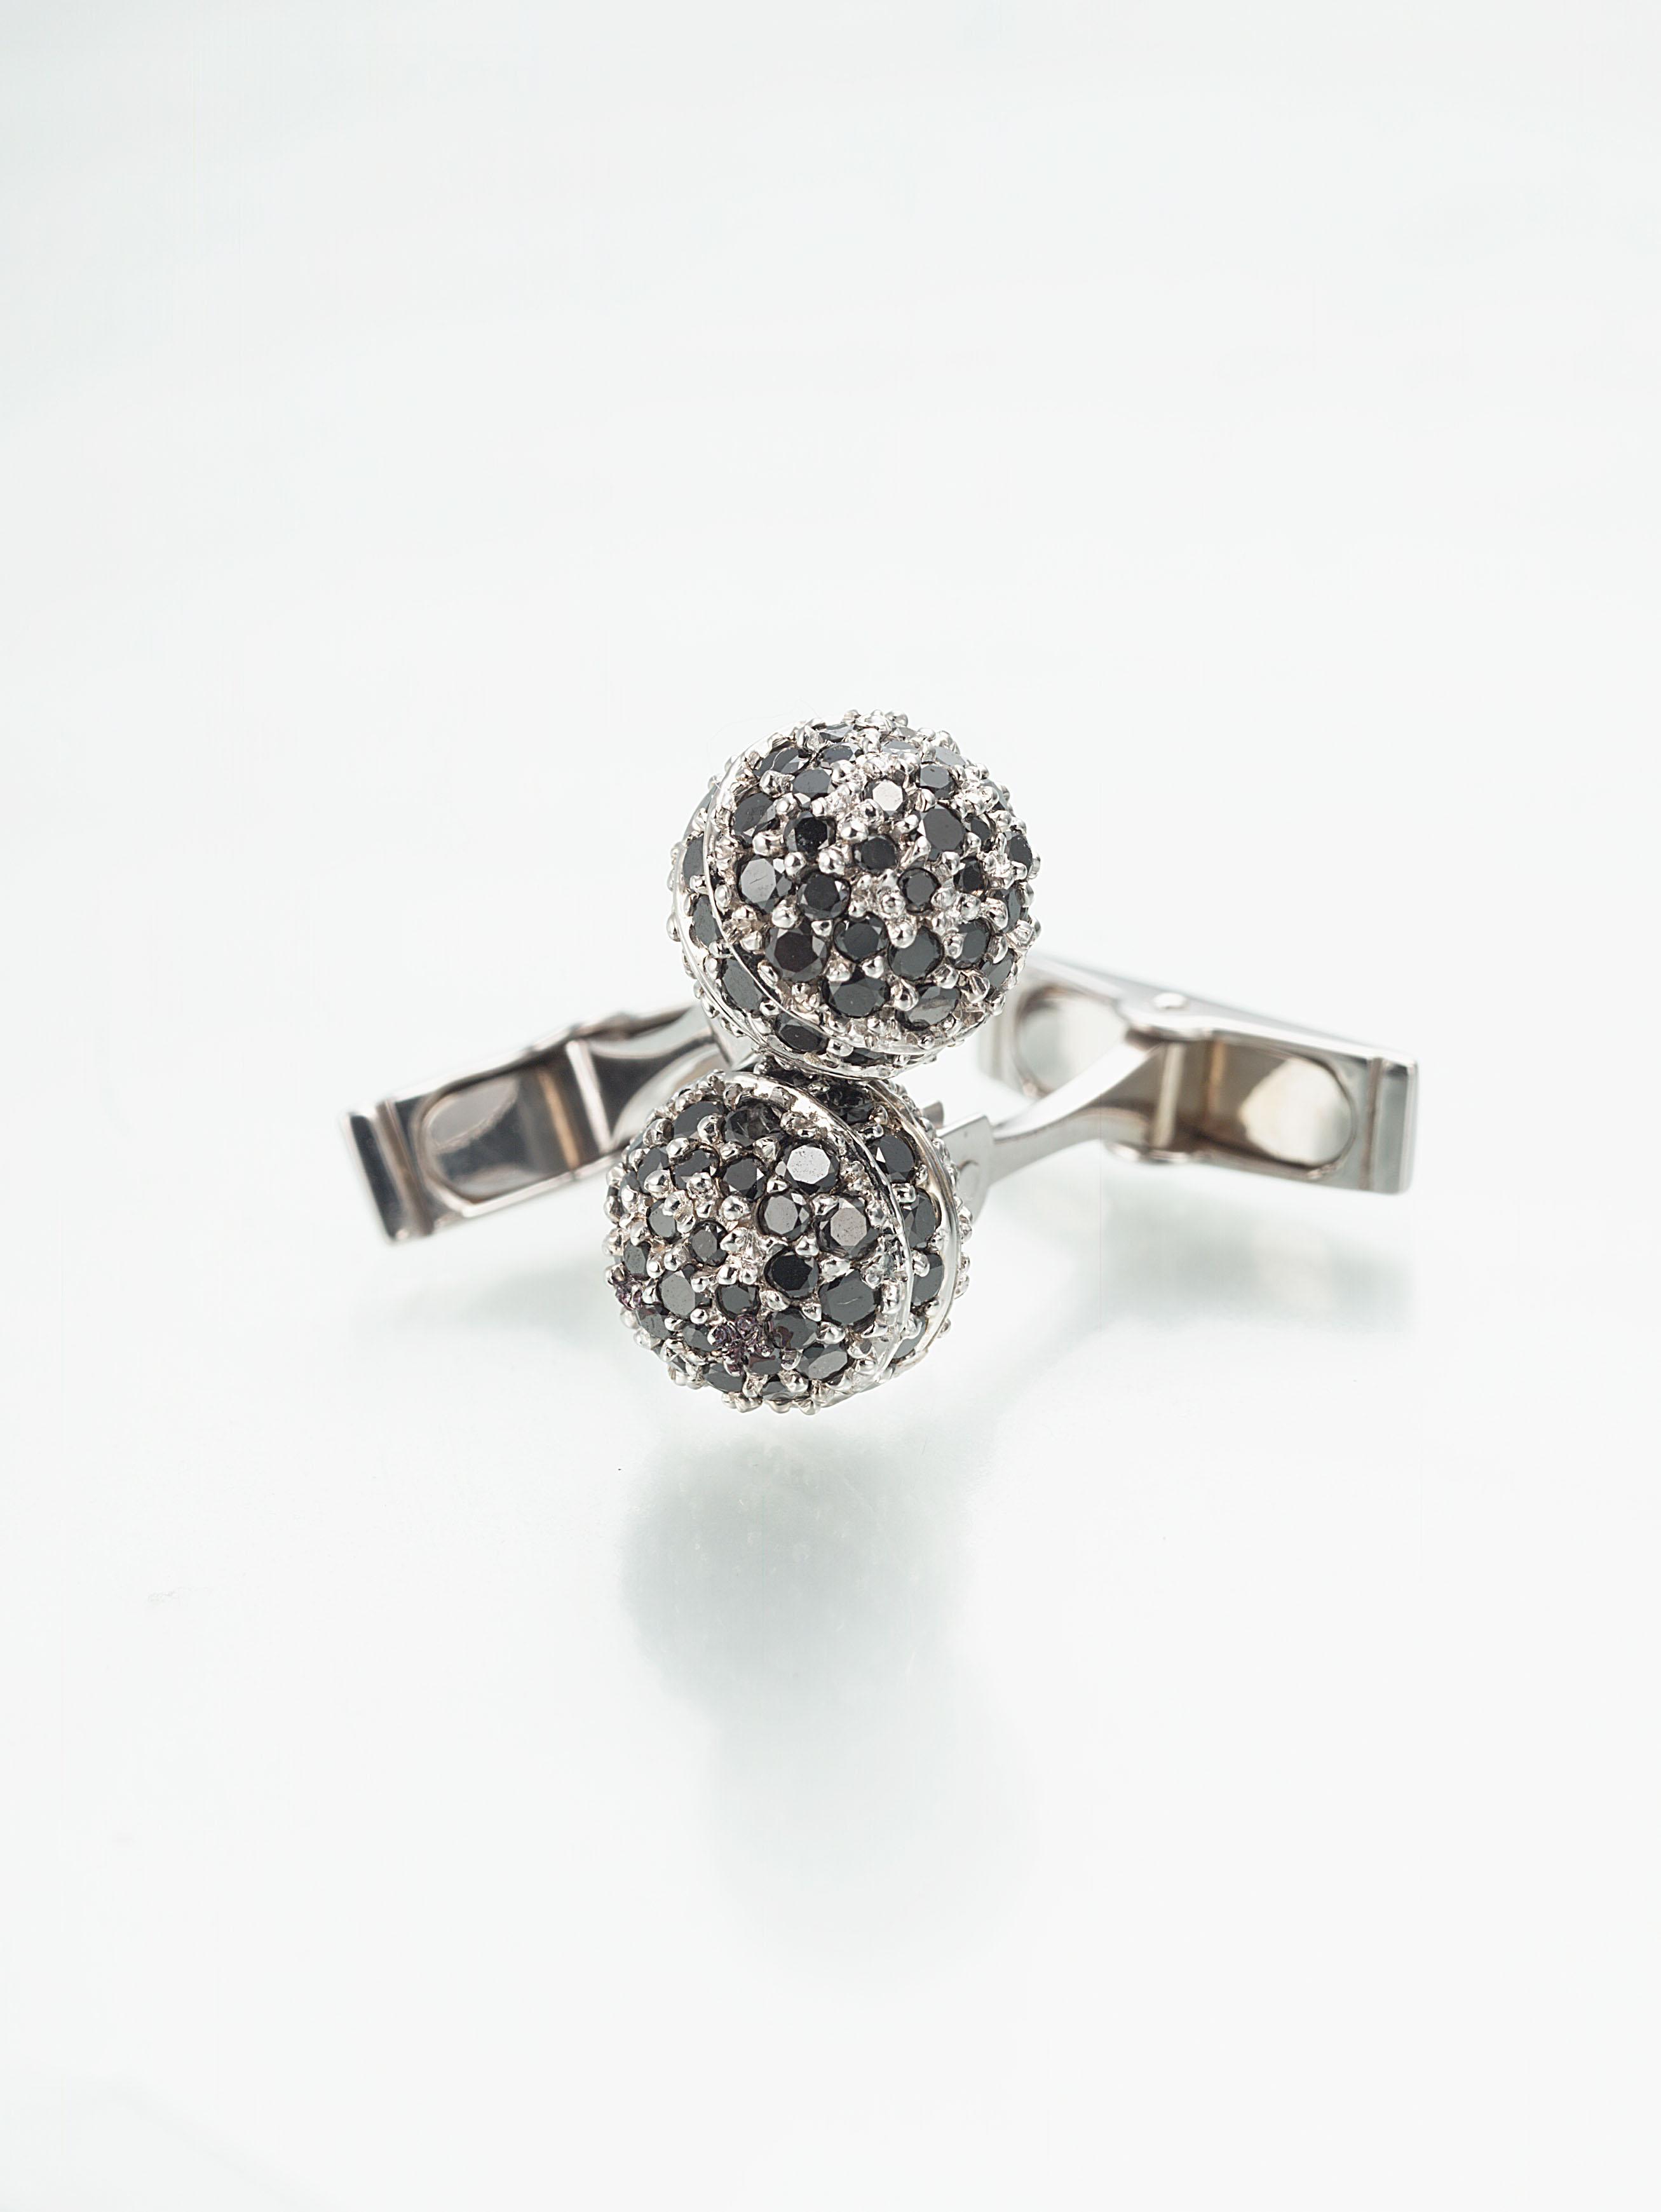 the missing lin sheryl jones designs puts cuff links back